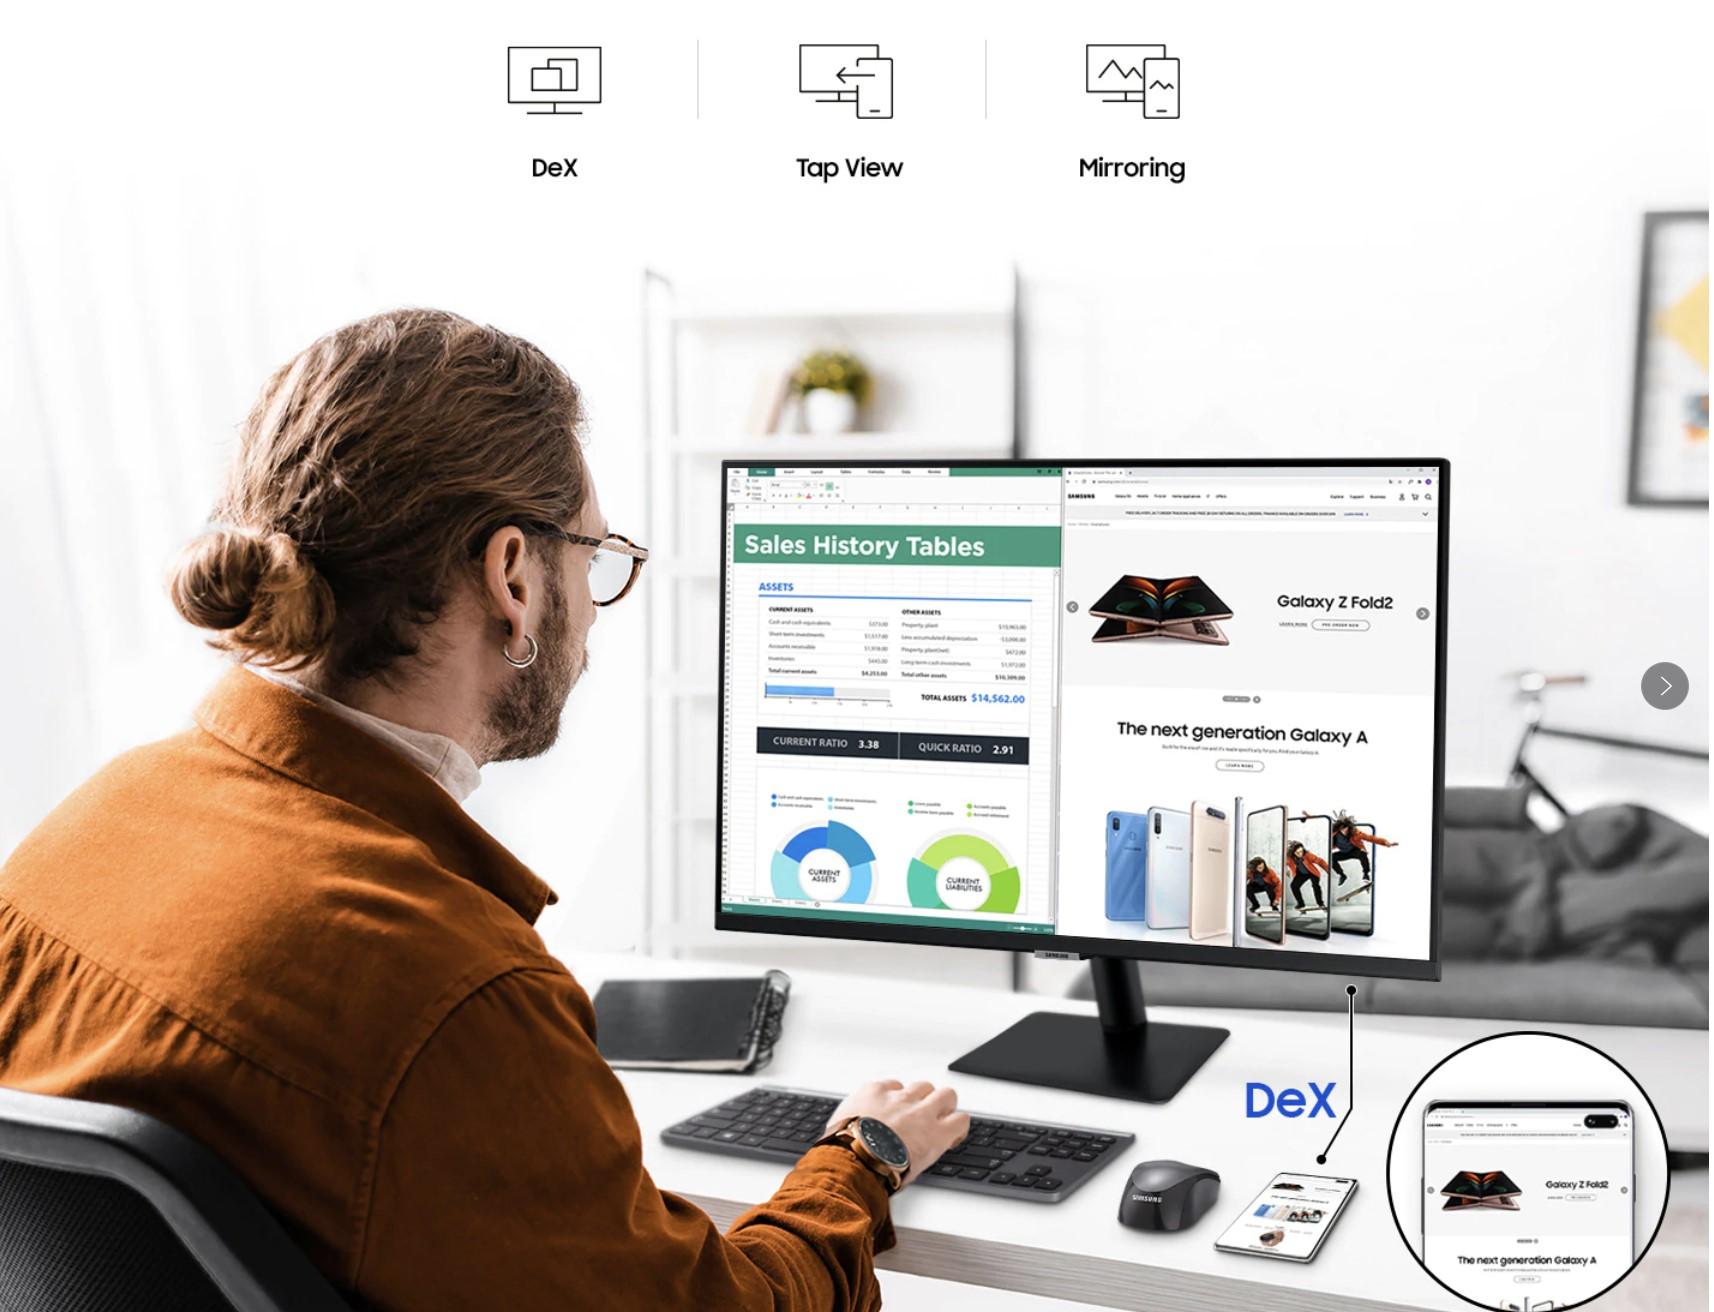 "Samsung M7 Monitor 5 REVIEW: A 32"" Monitor That Mimics A Samsung TV & Gives Office 365 Access"